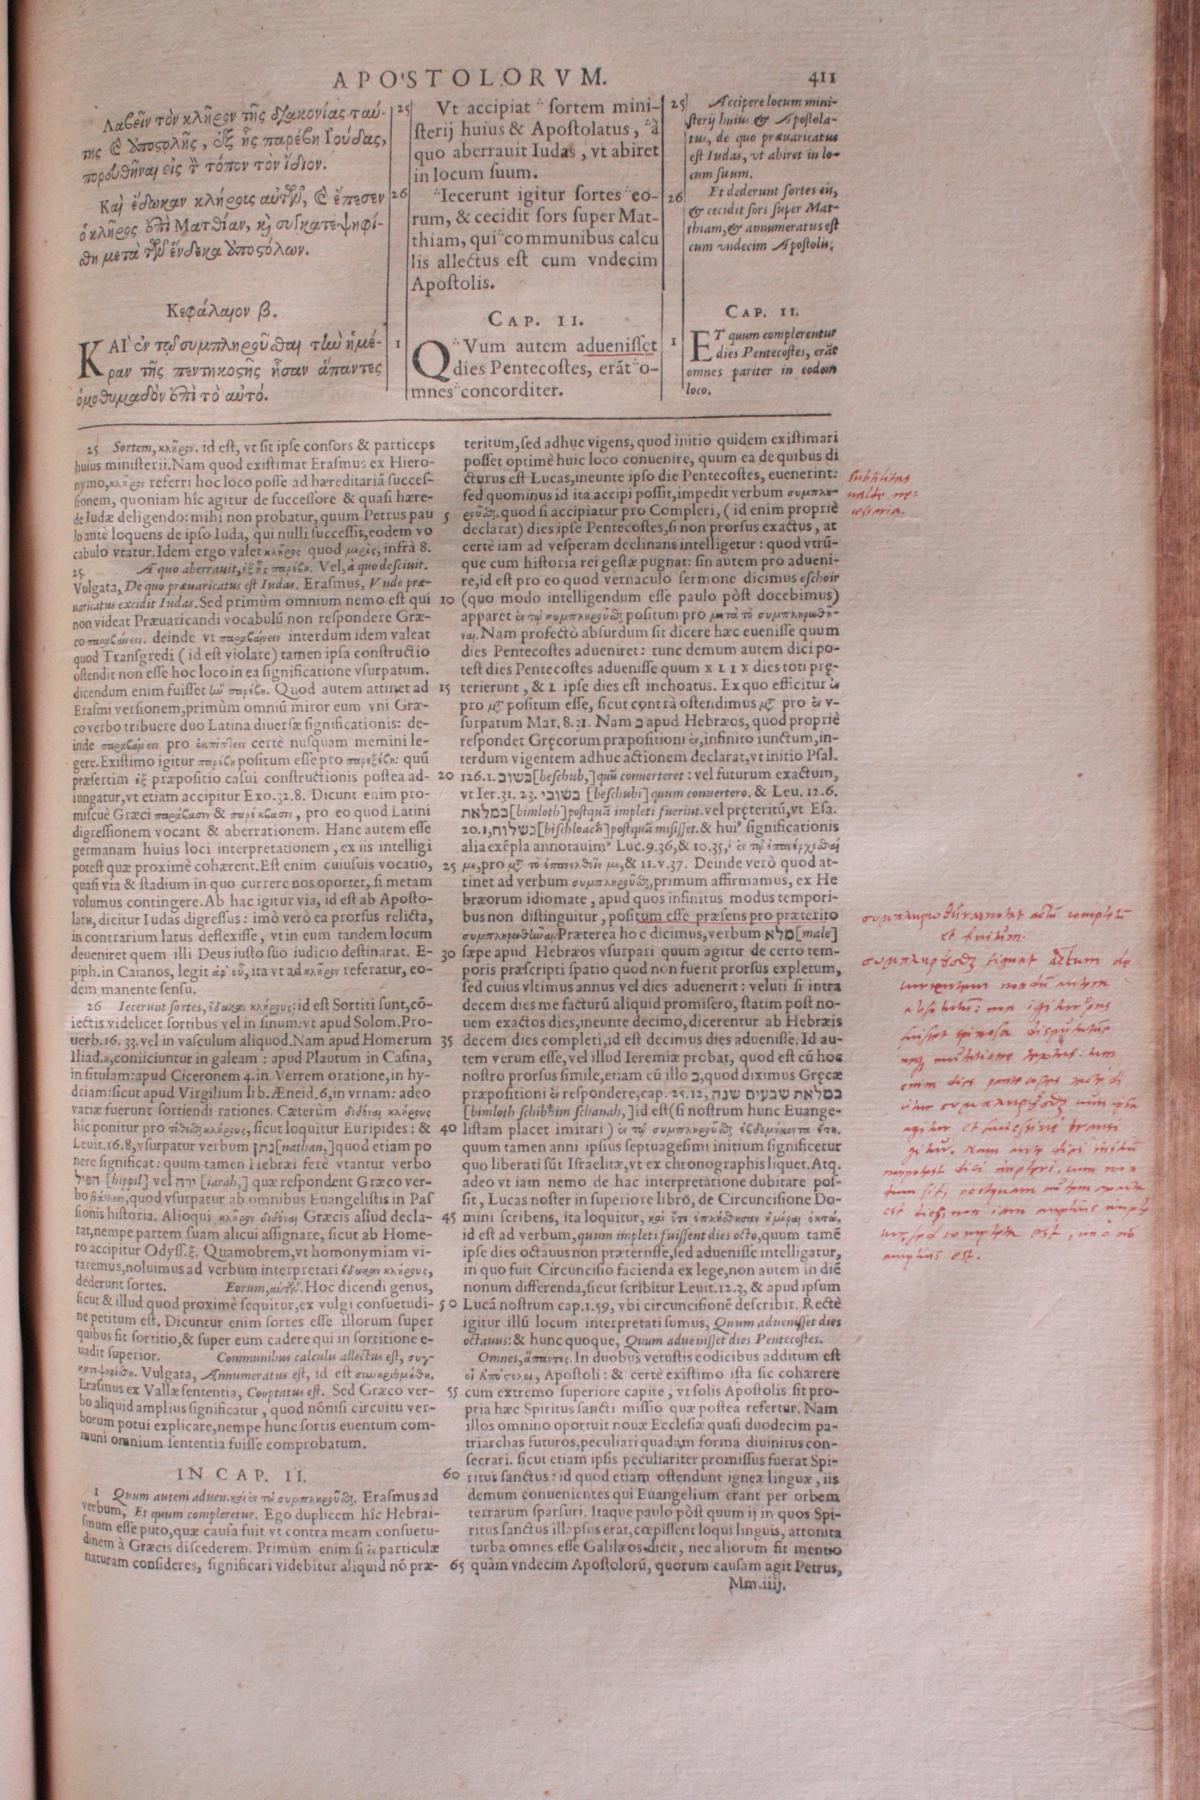 Griechische-Lateinische Bibel, Novum Testamentum 1582-10